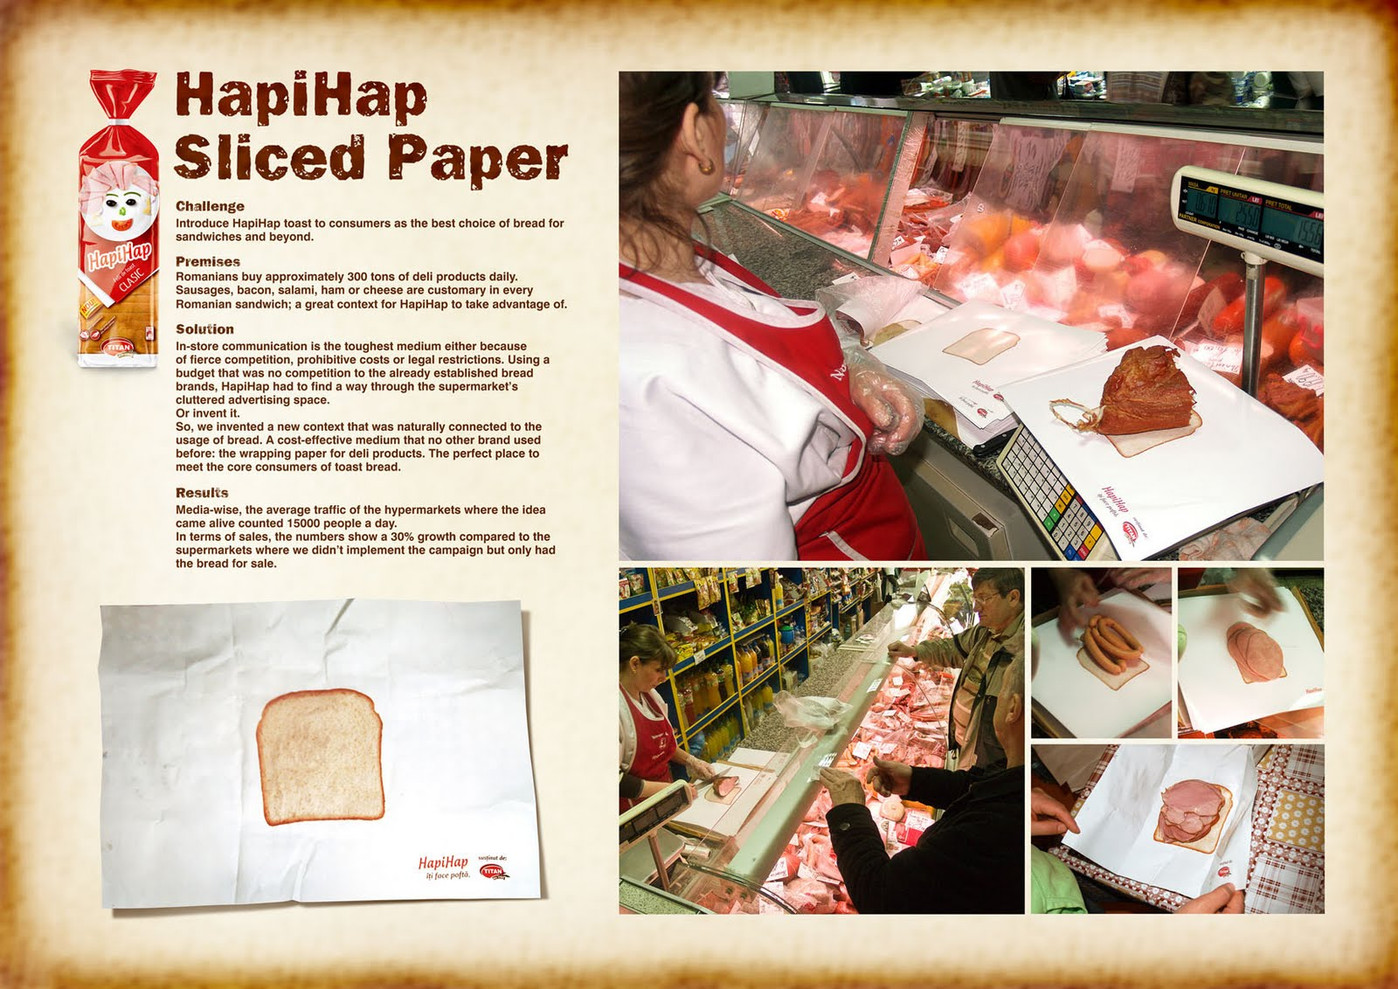 HapiHap-Sliced Paper.jpg